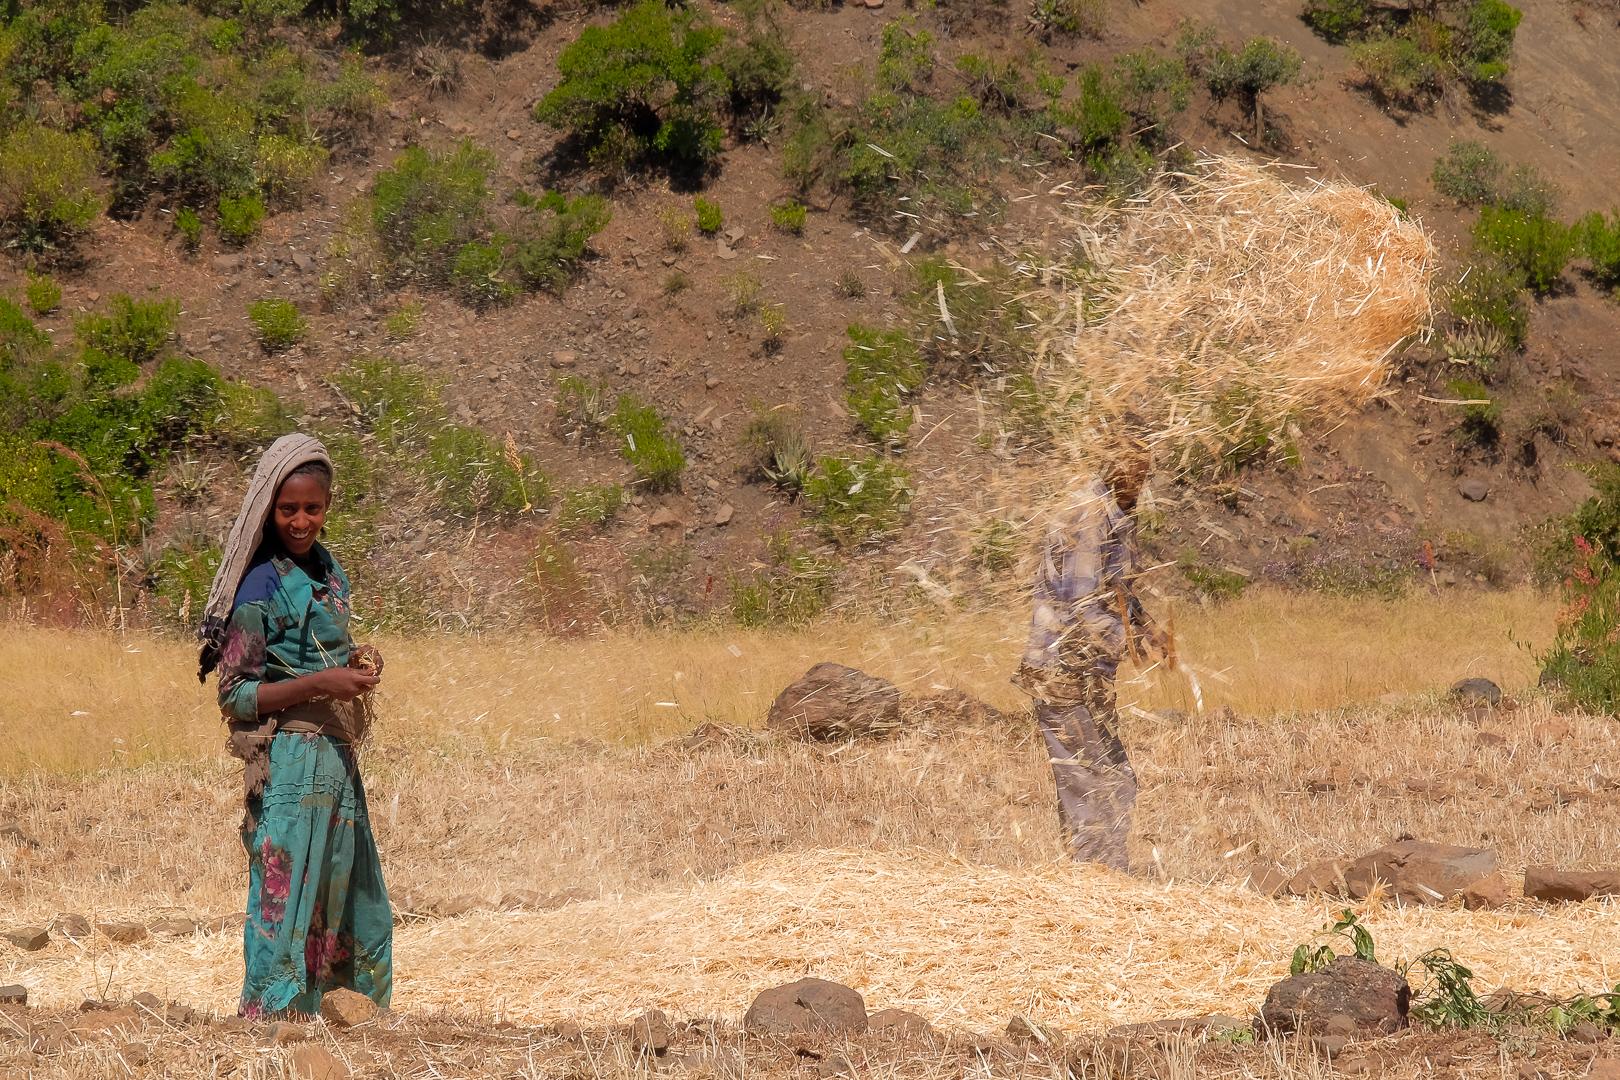 teff crops during harvest season